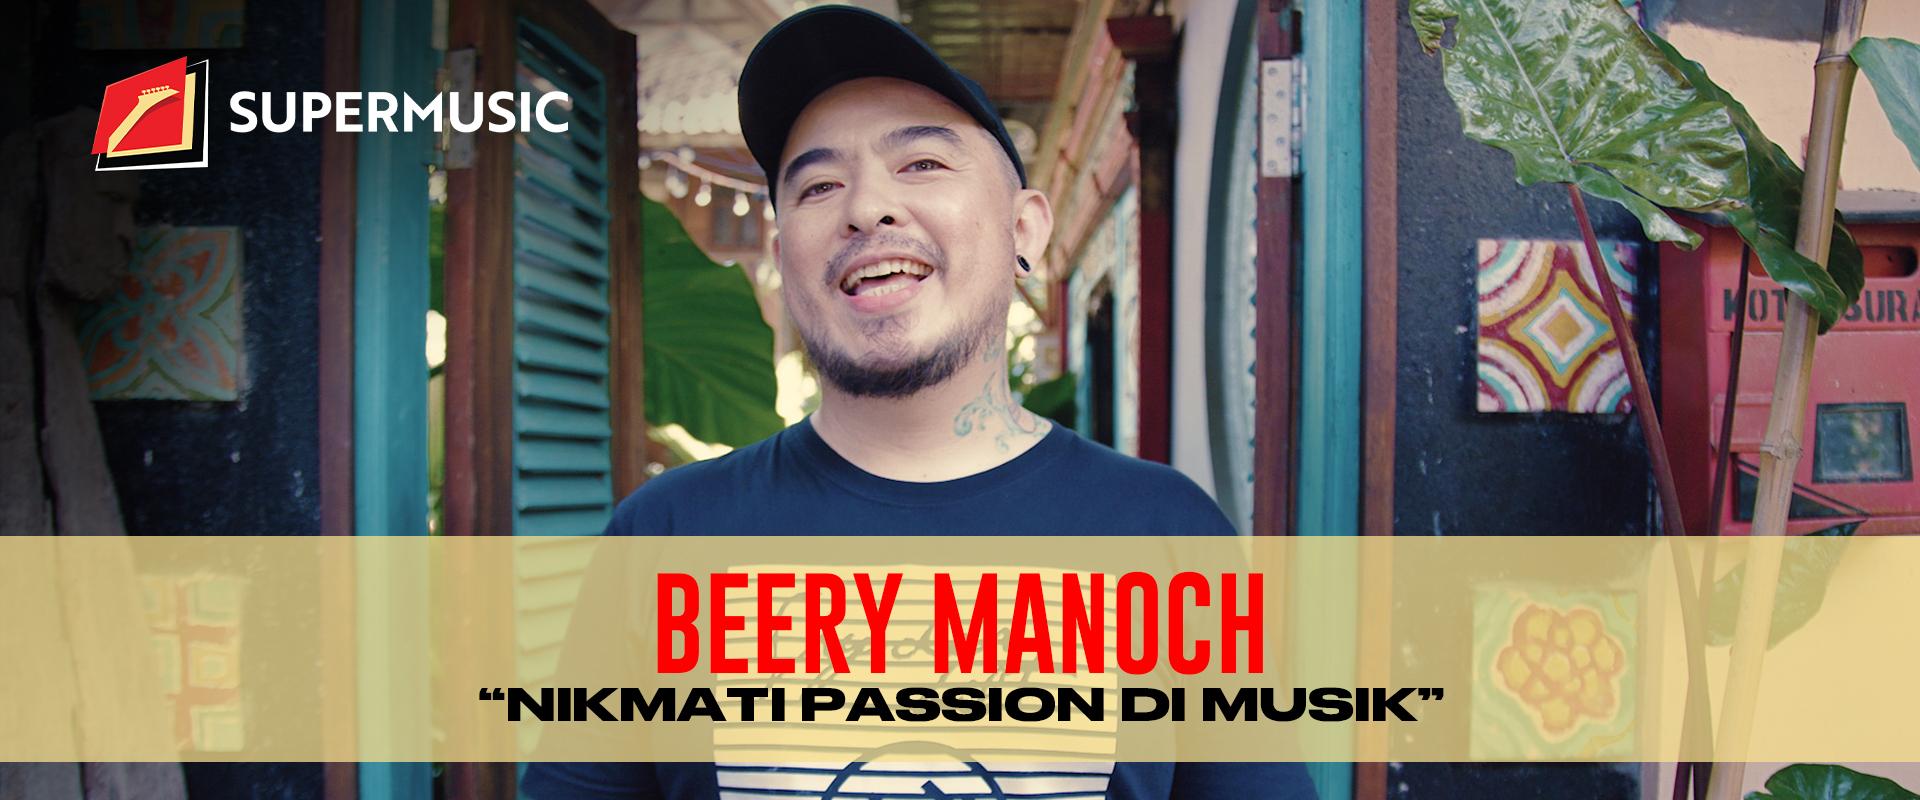 Beery Manoch